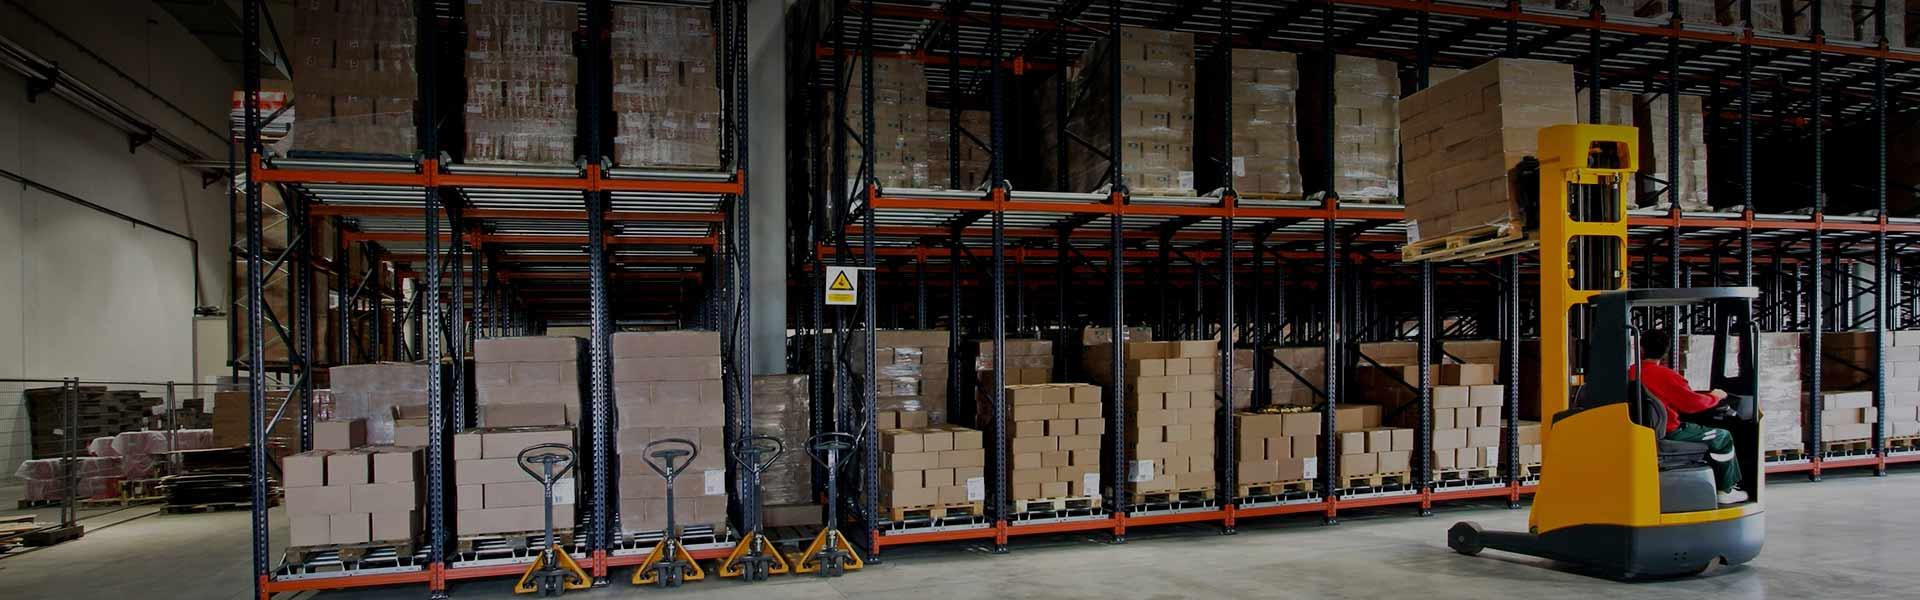 warehouse simulation software